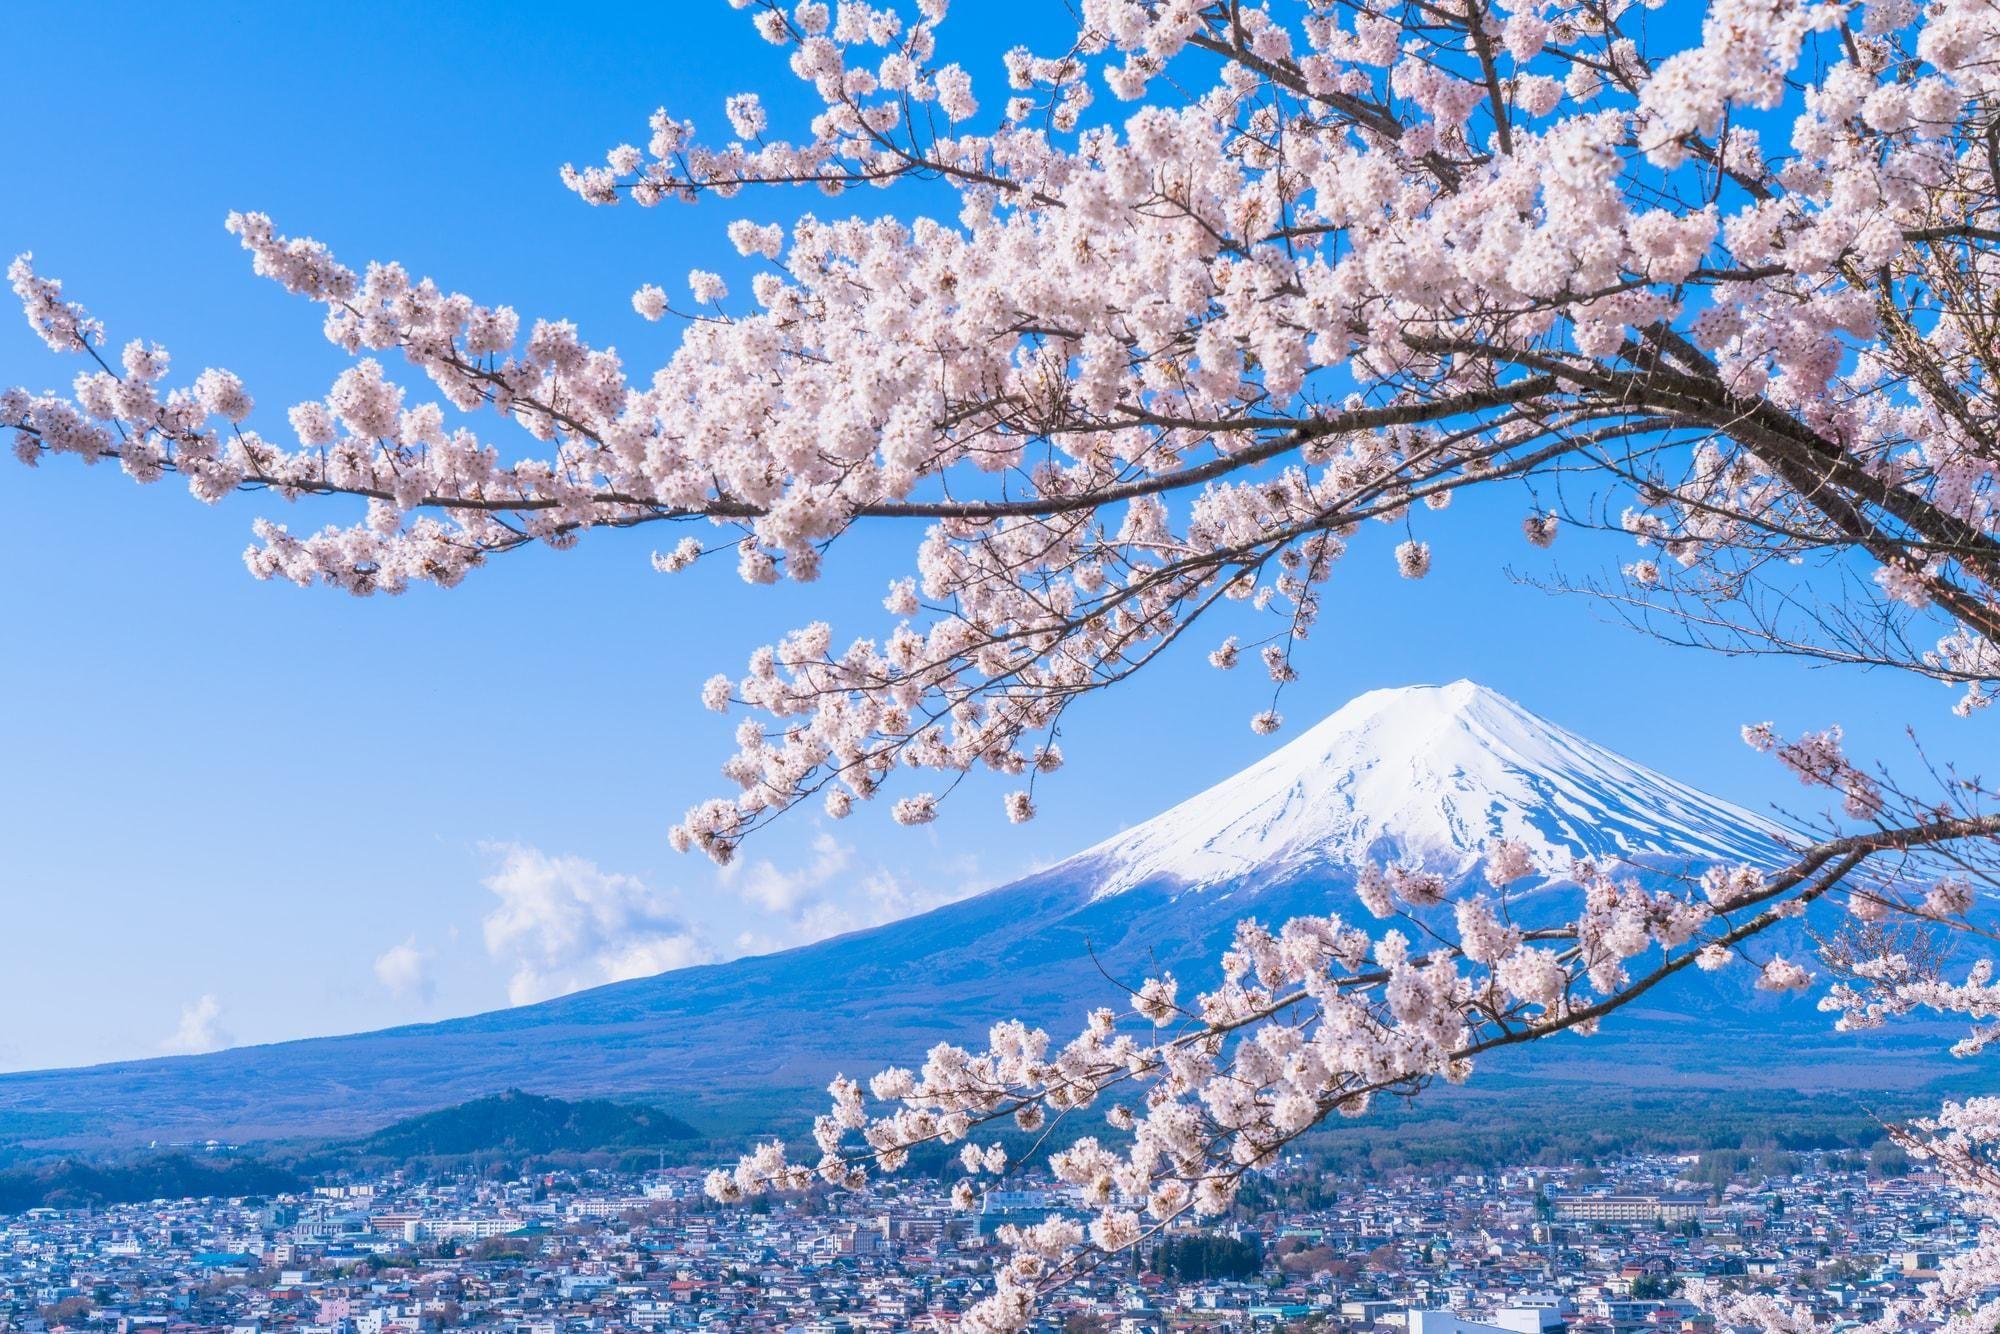 Cherry Blossom Japan Guided Tour New Departure 13 April 2018 17 Day Tour Https Mondotravel Co Nz Arti Cherry Blossom Japan Japan Travel Mount Fuji